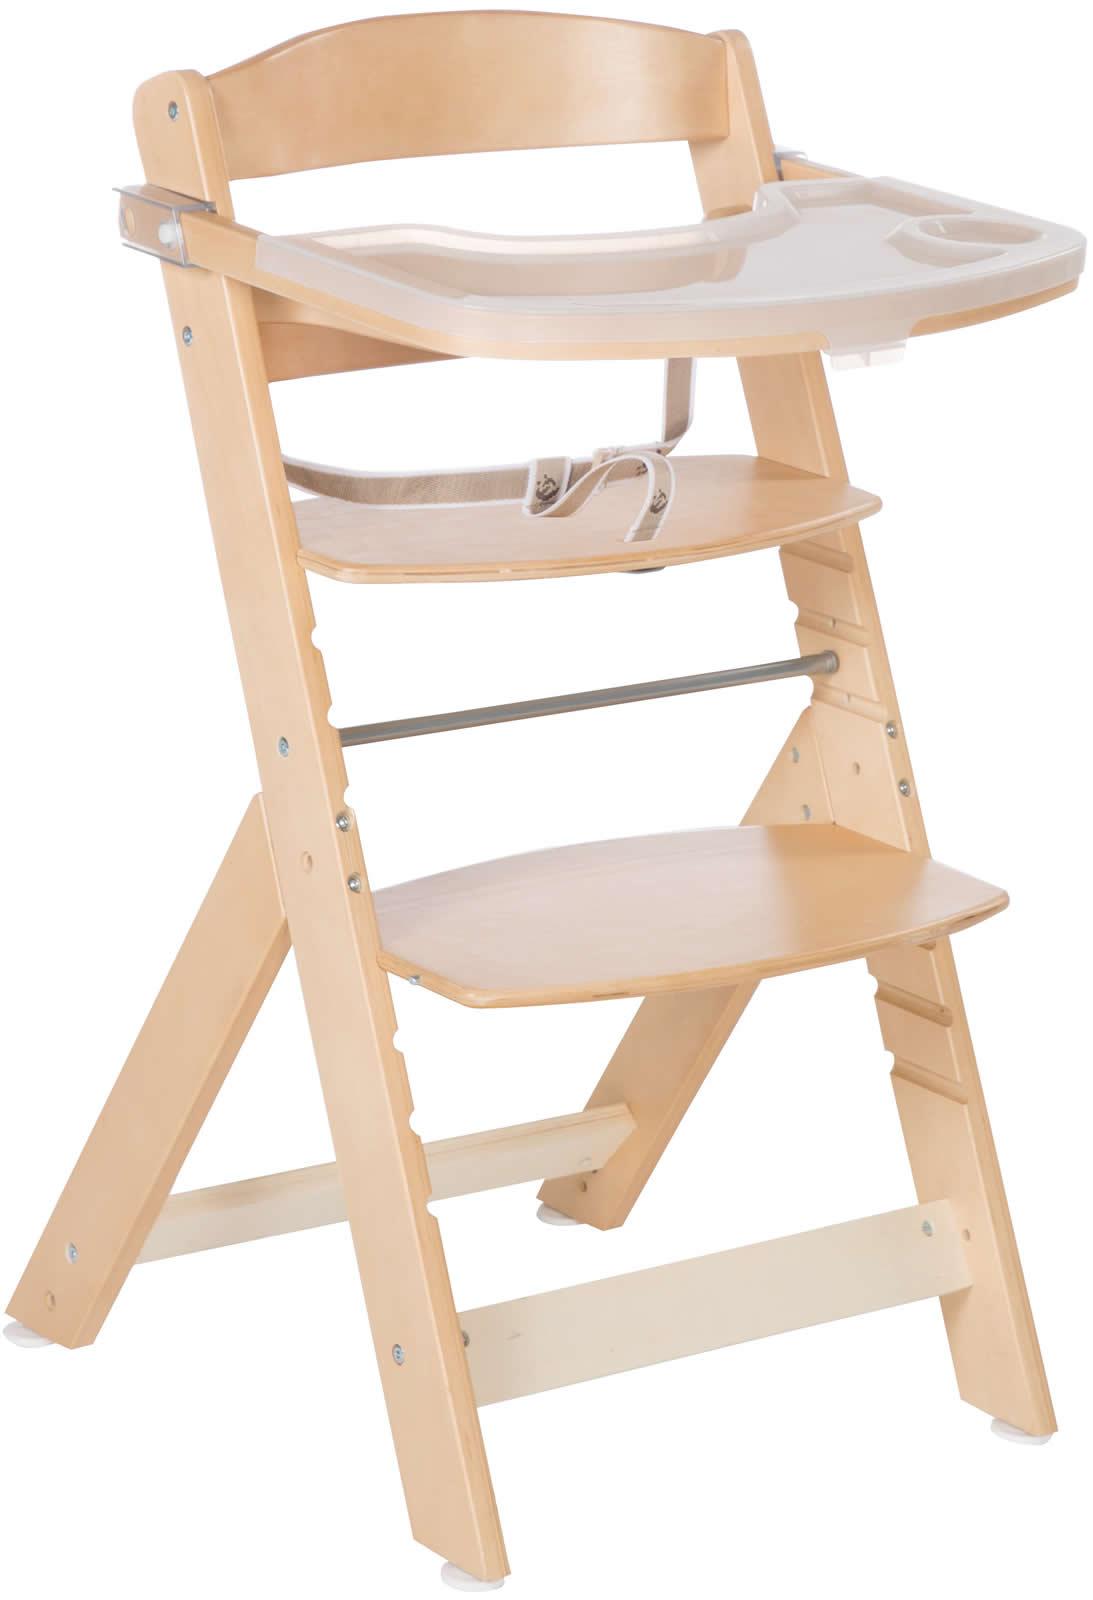 roba treppenhochstuhl sit up super maxi hochstuhl kinderhochstuhl holz ebay. Black Bedroom Furniture Sets. Home Design Ideas